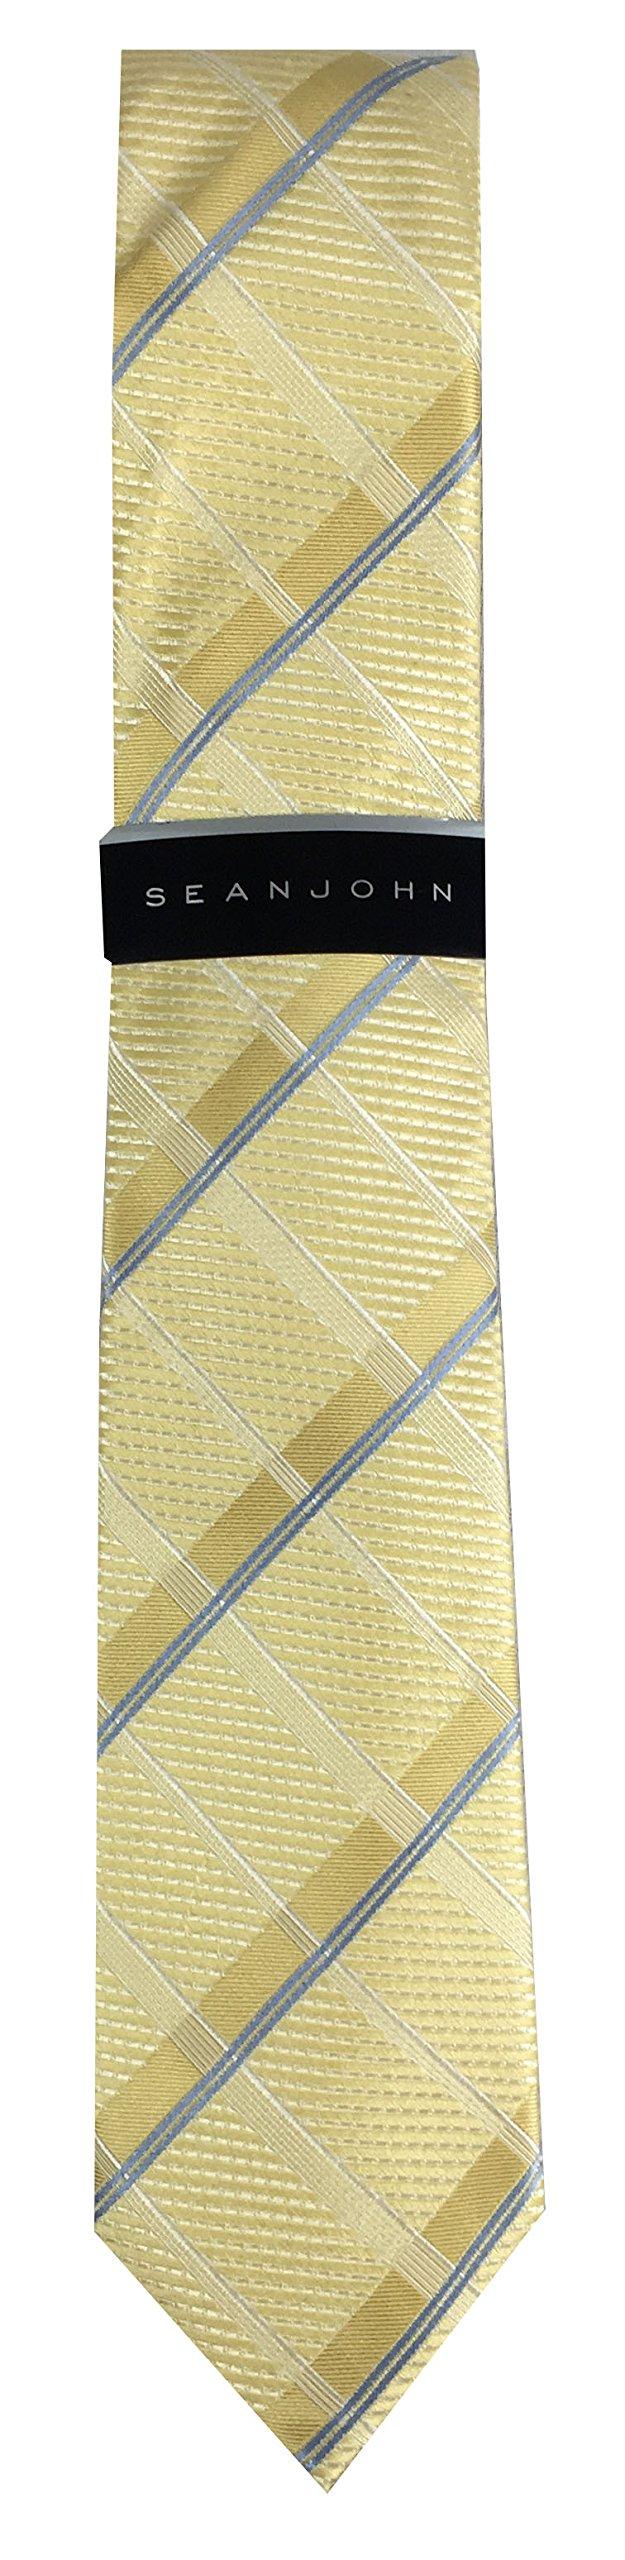 Sean John Men's Tie (Gold Plaid)